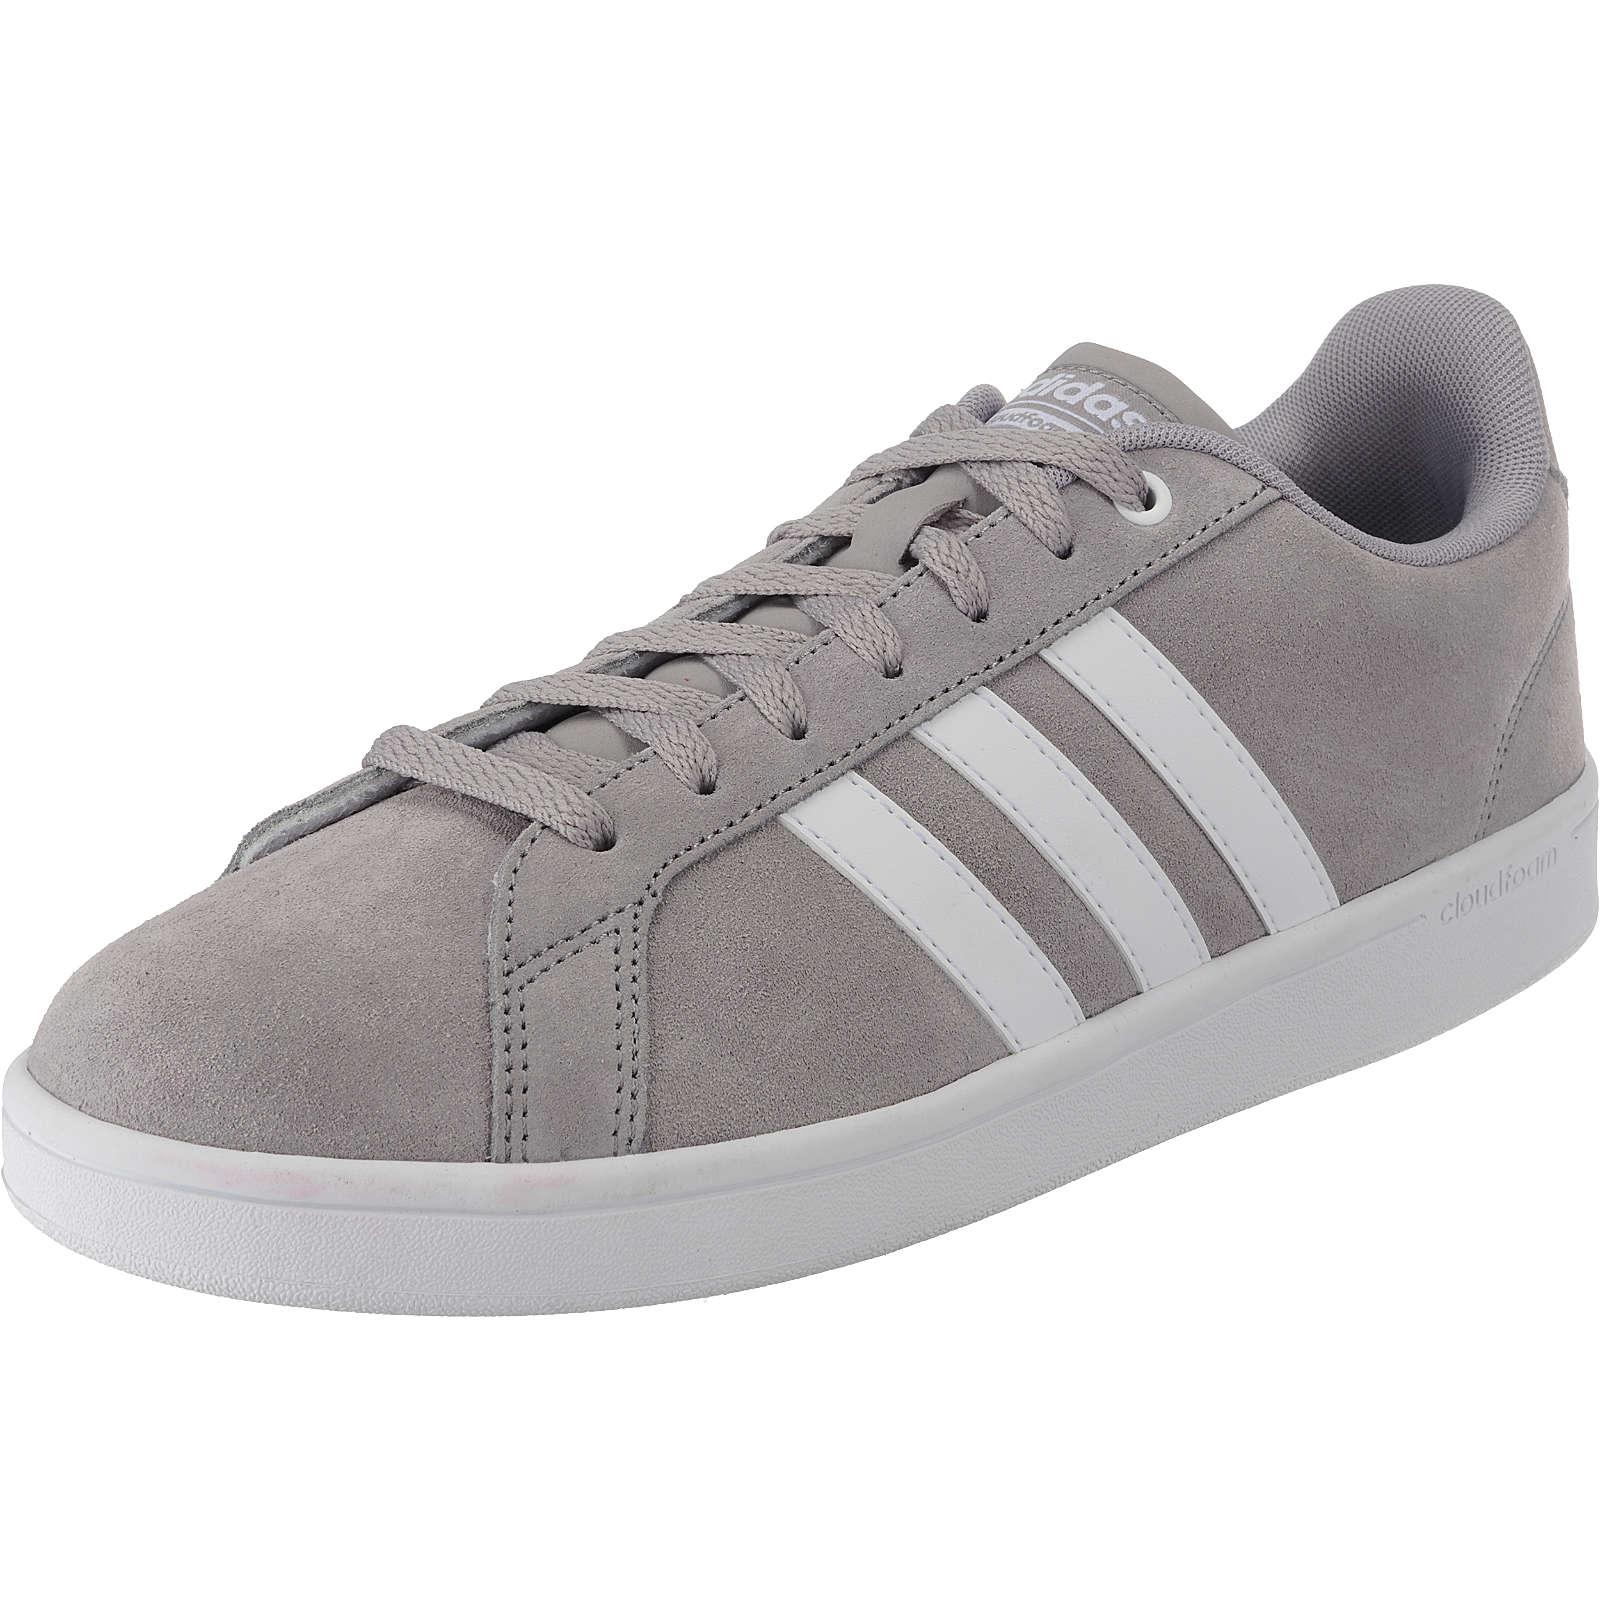 adidas Sport Inspired Cf Advantage Sneakers Low hellgrau Herren Gr. 42